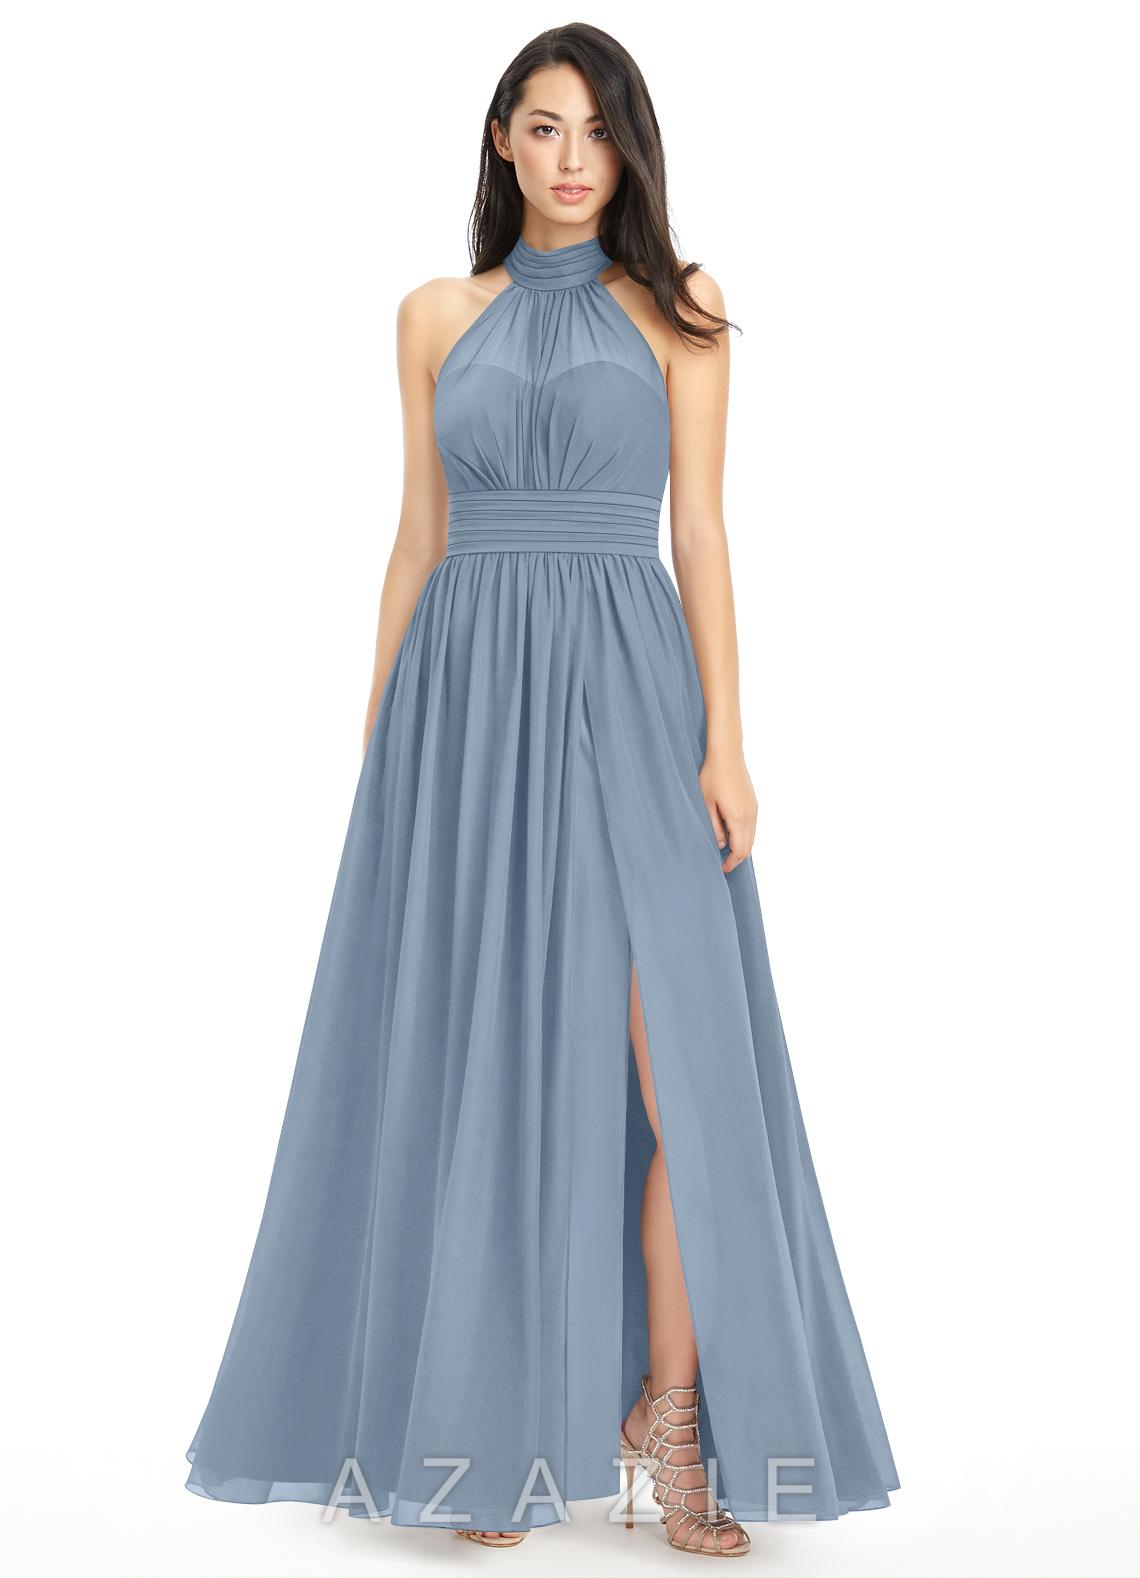 Blue dress long 7 64